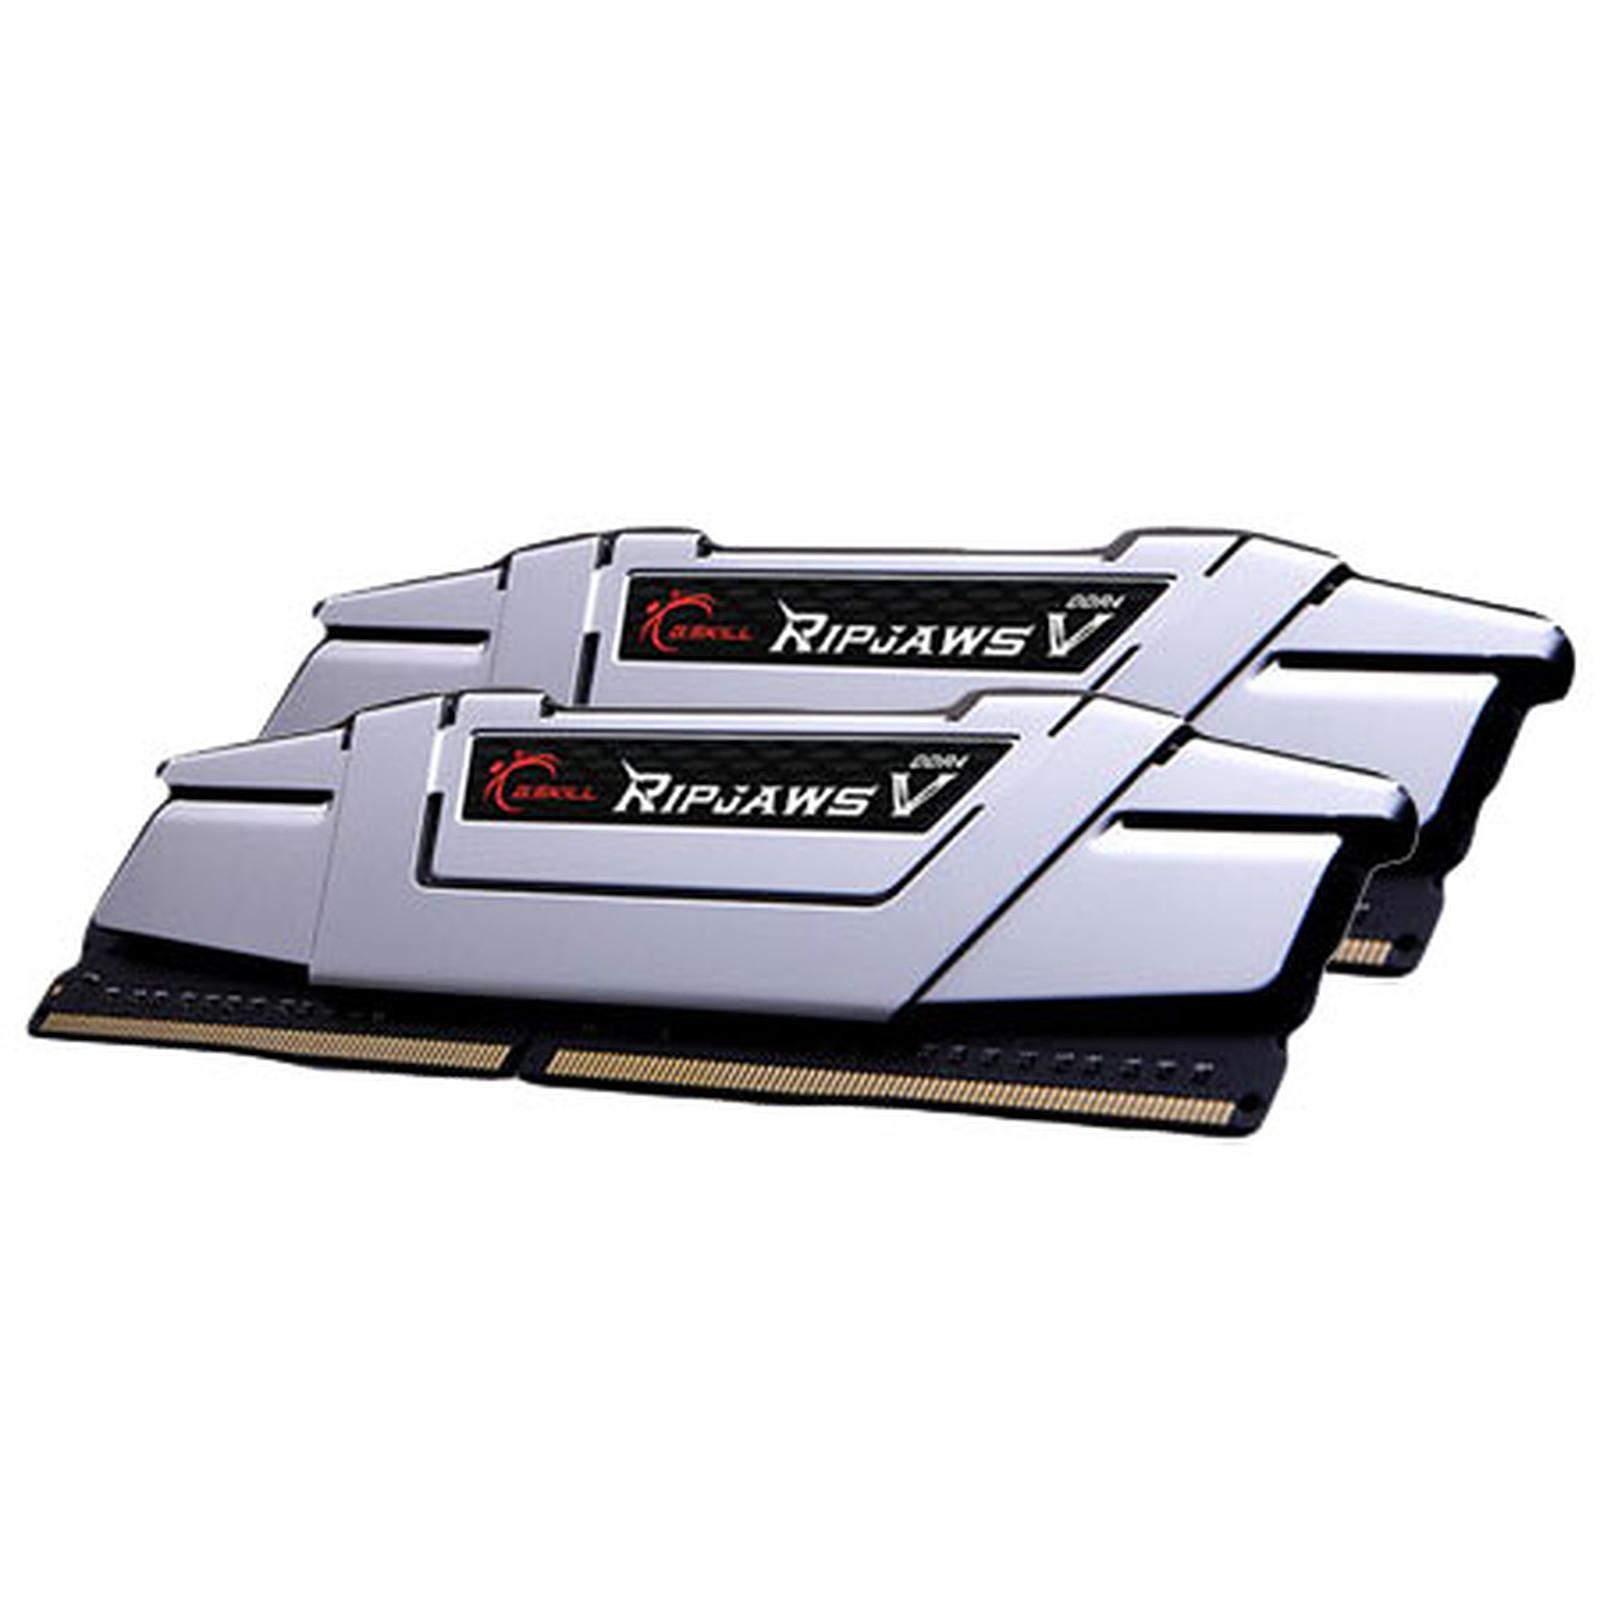 G.Skill RipJaws 5 Series Argent 16 Go (2x 8 Go) DDR4 3000 MHz CL15